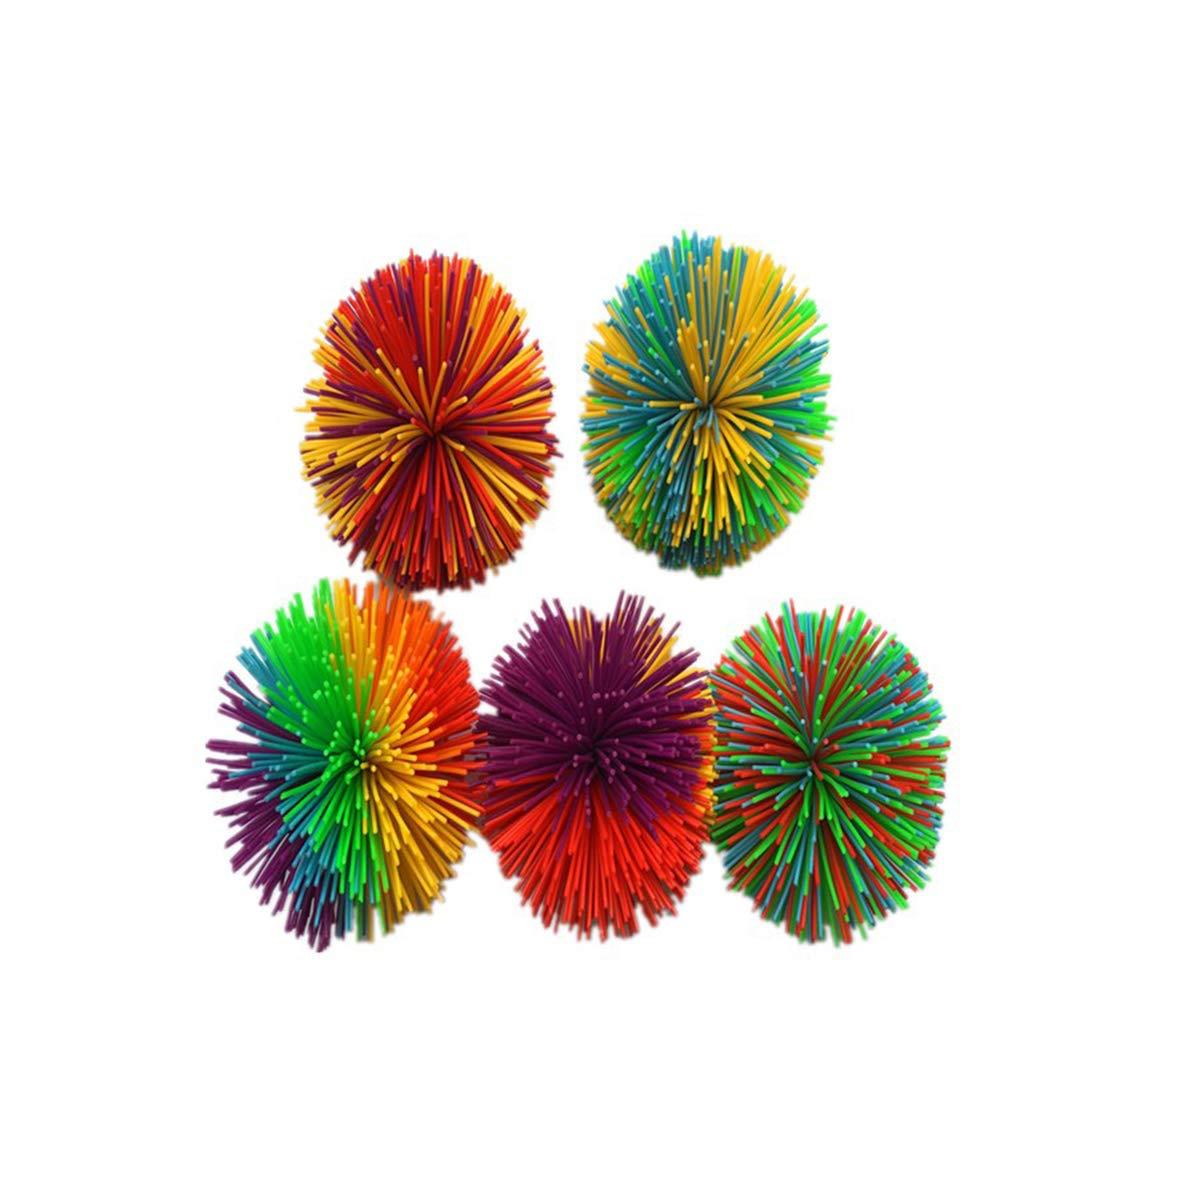 Toyvian 5 unids Bola de Colores Stringy Silicona rebotando Mullido ...